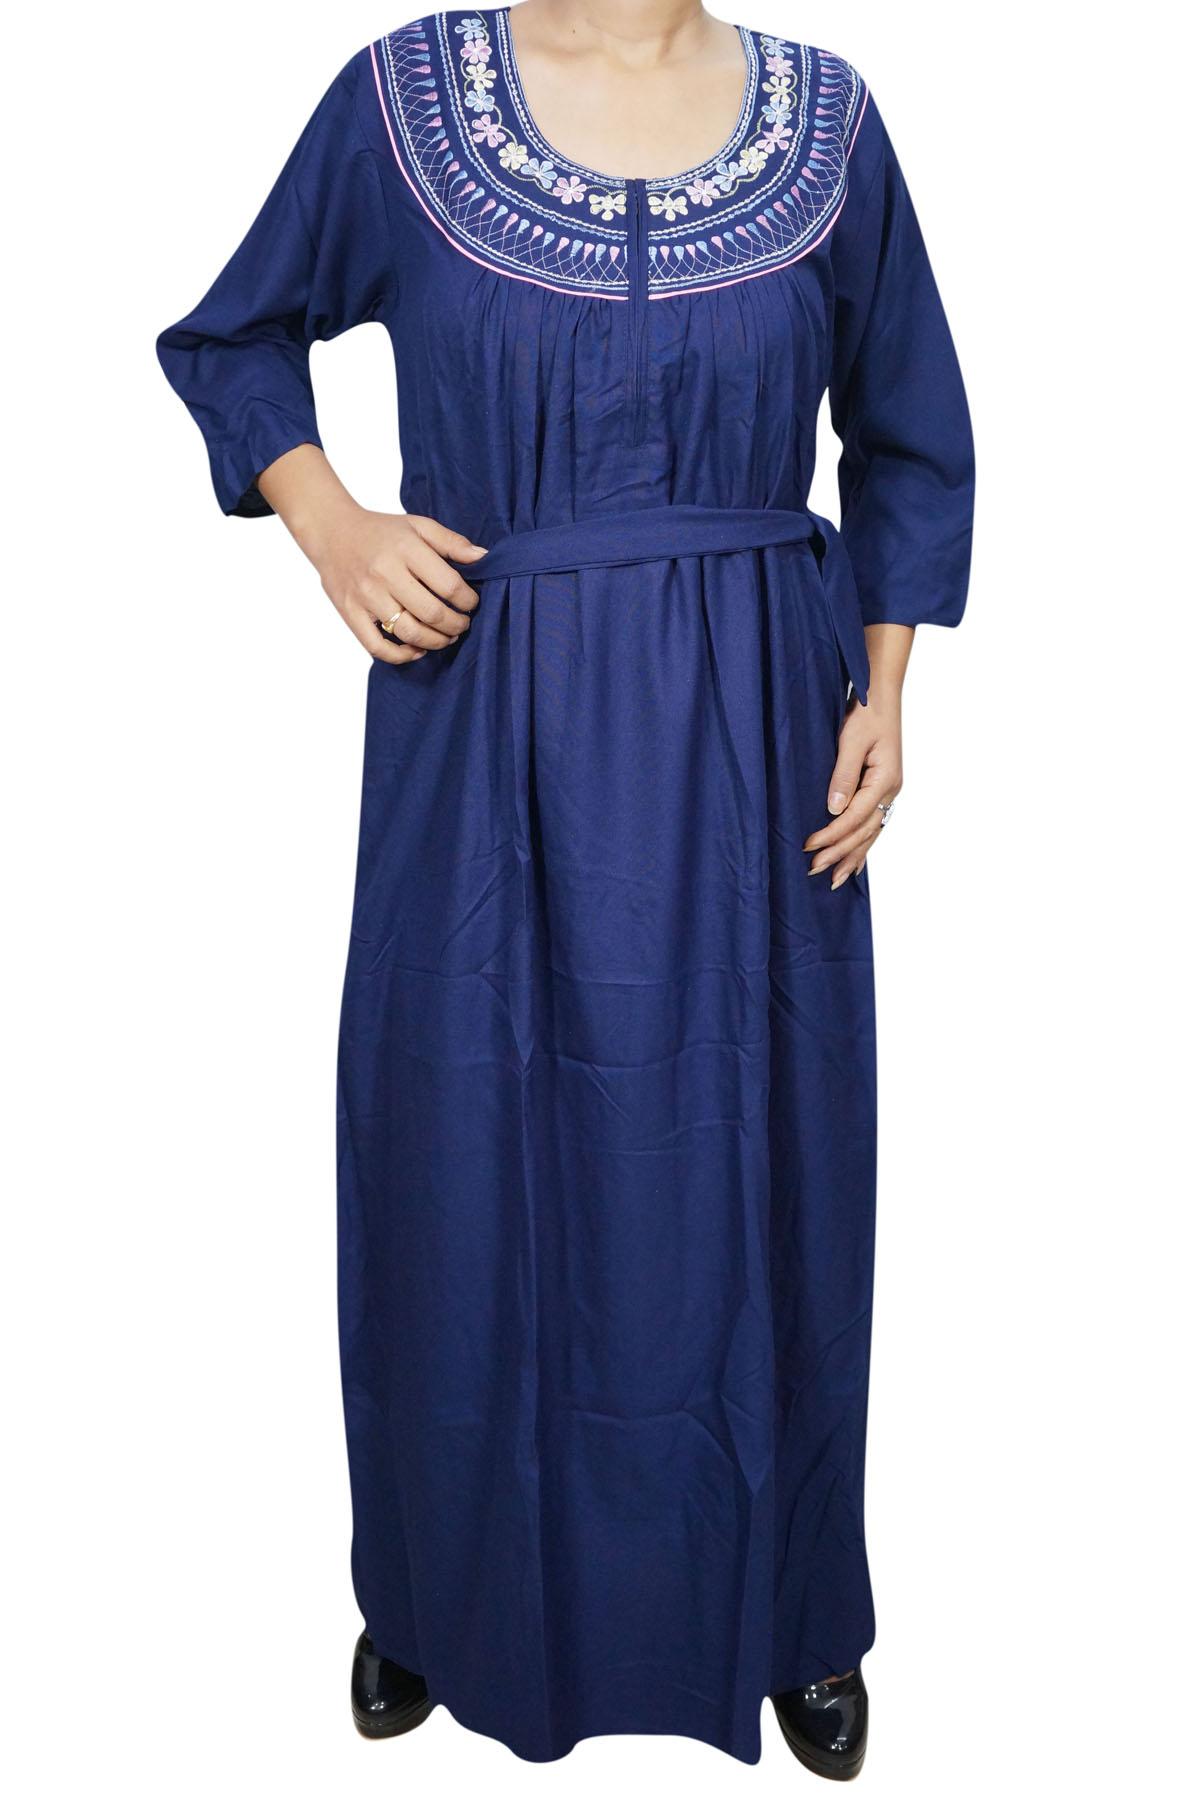 WOMEN COMFY LONG NIGHTY WINTER WARM SLEEPWEAR MAXI NIGHT DRESS ...